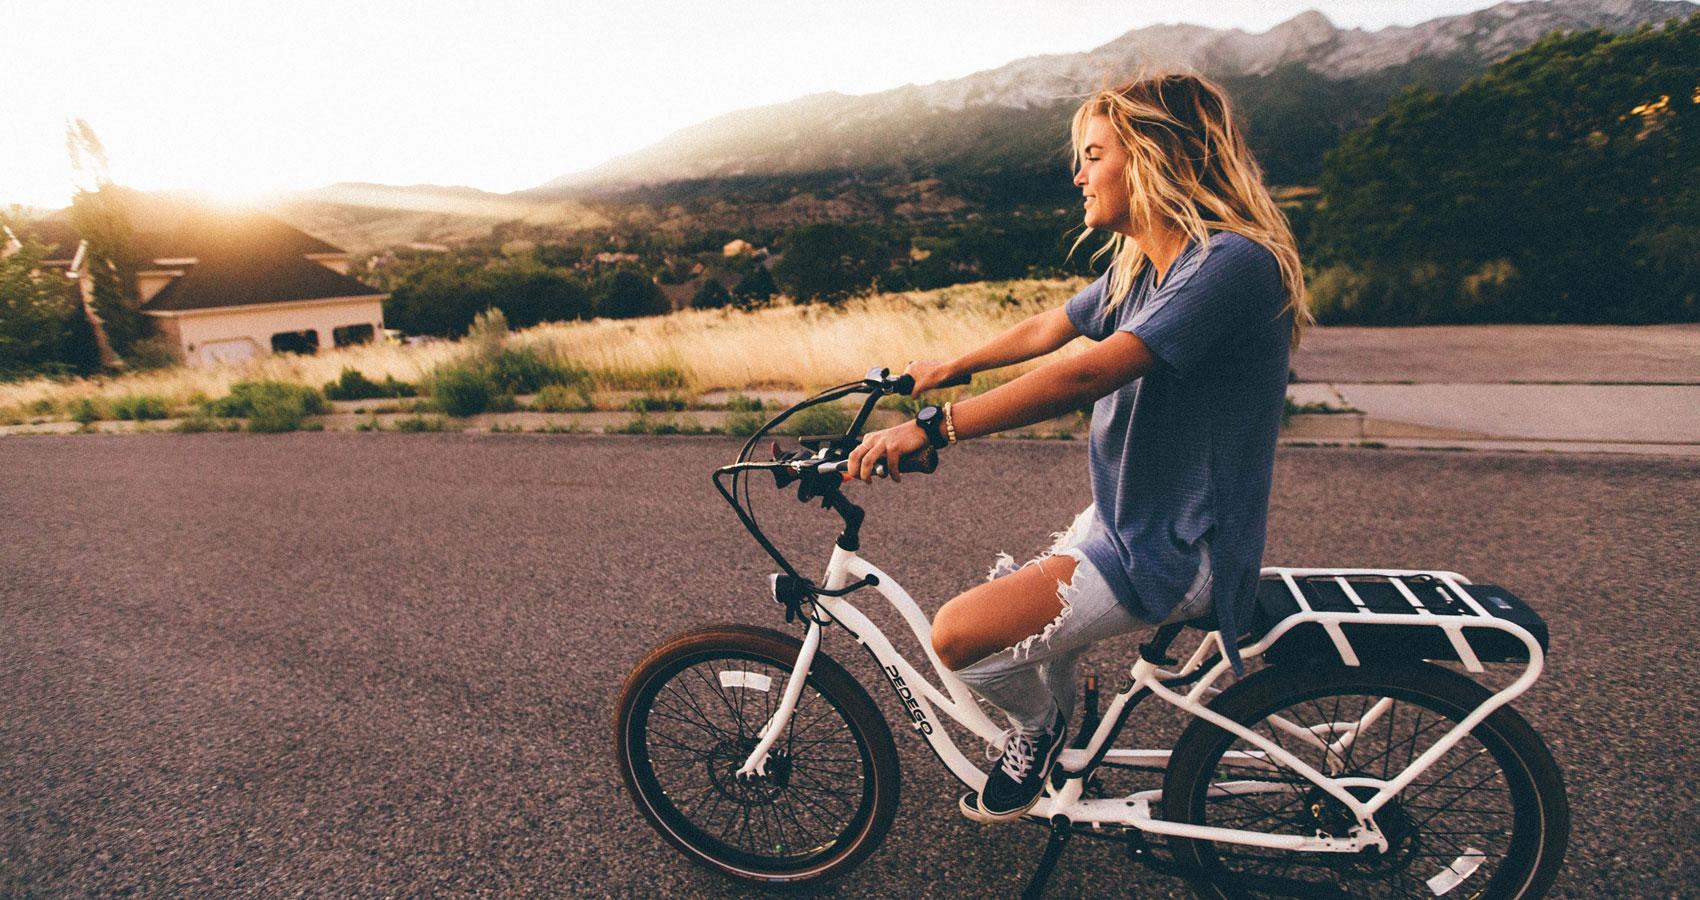 Bike Ride written by Vickie Mryczko at Spillwords.com